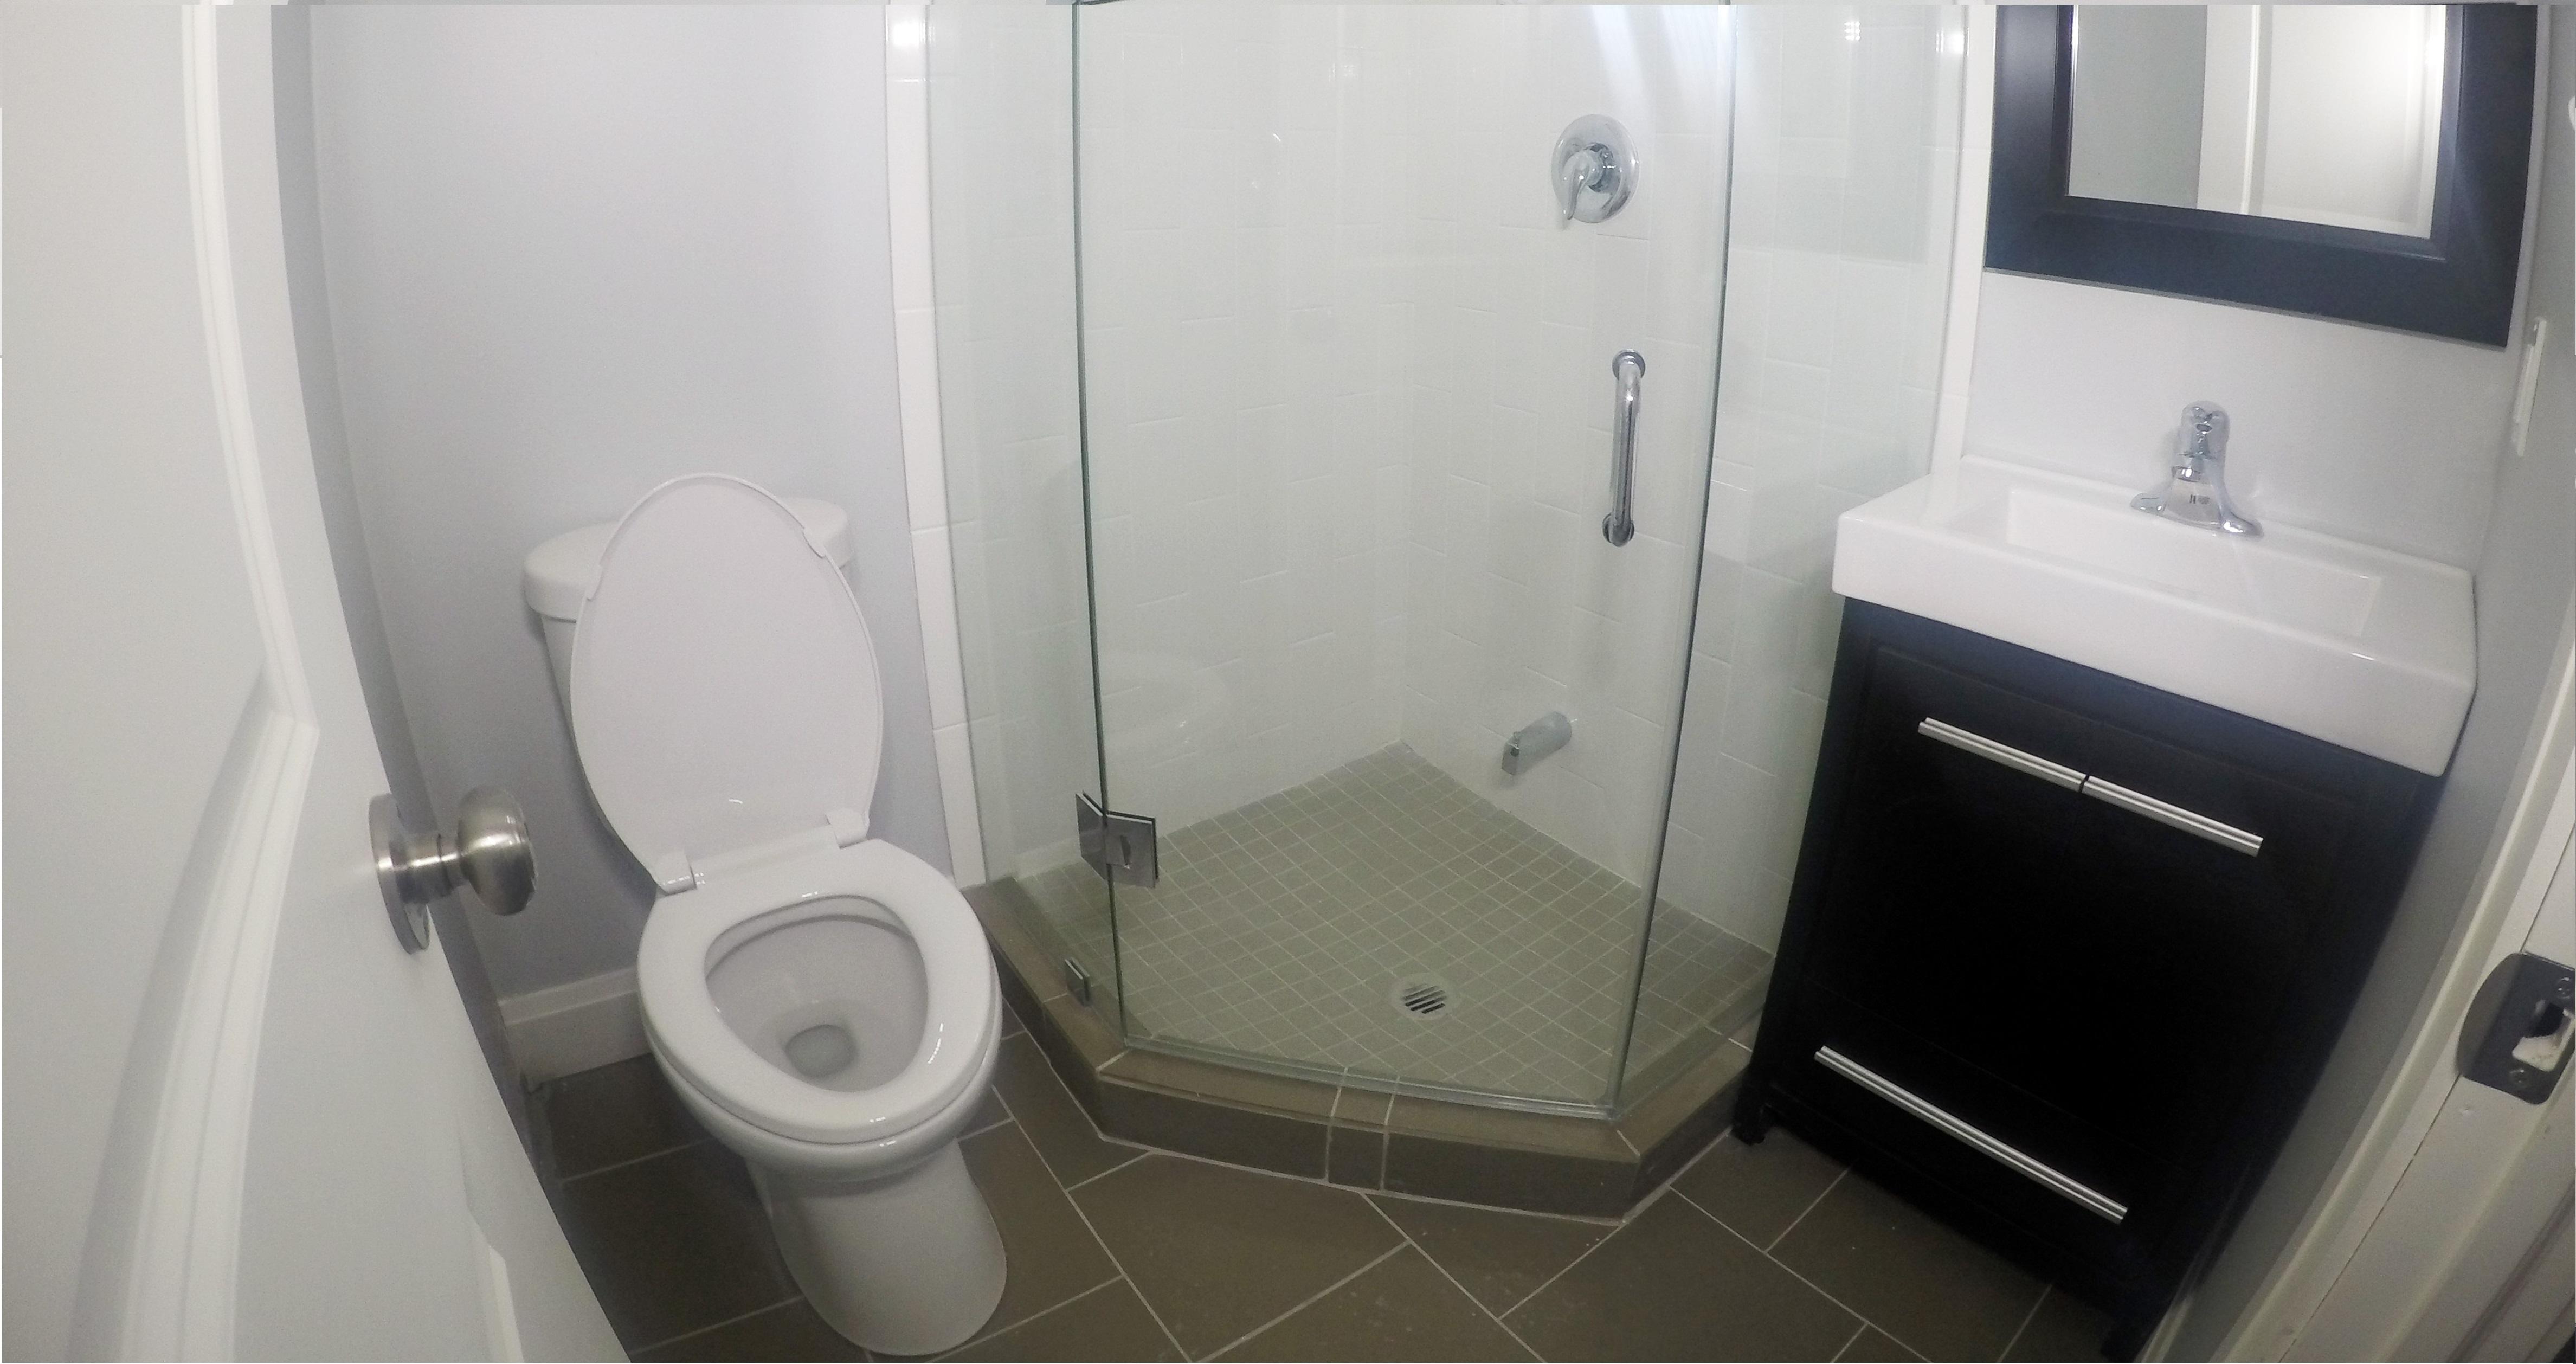 Bathroom_GoPro_unbranded